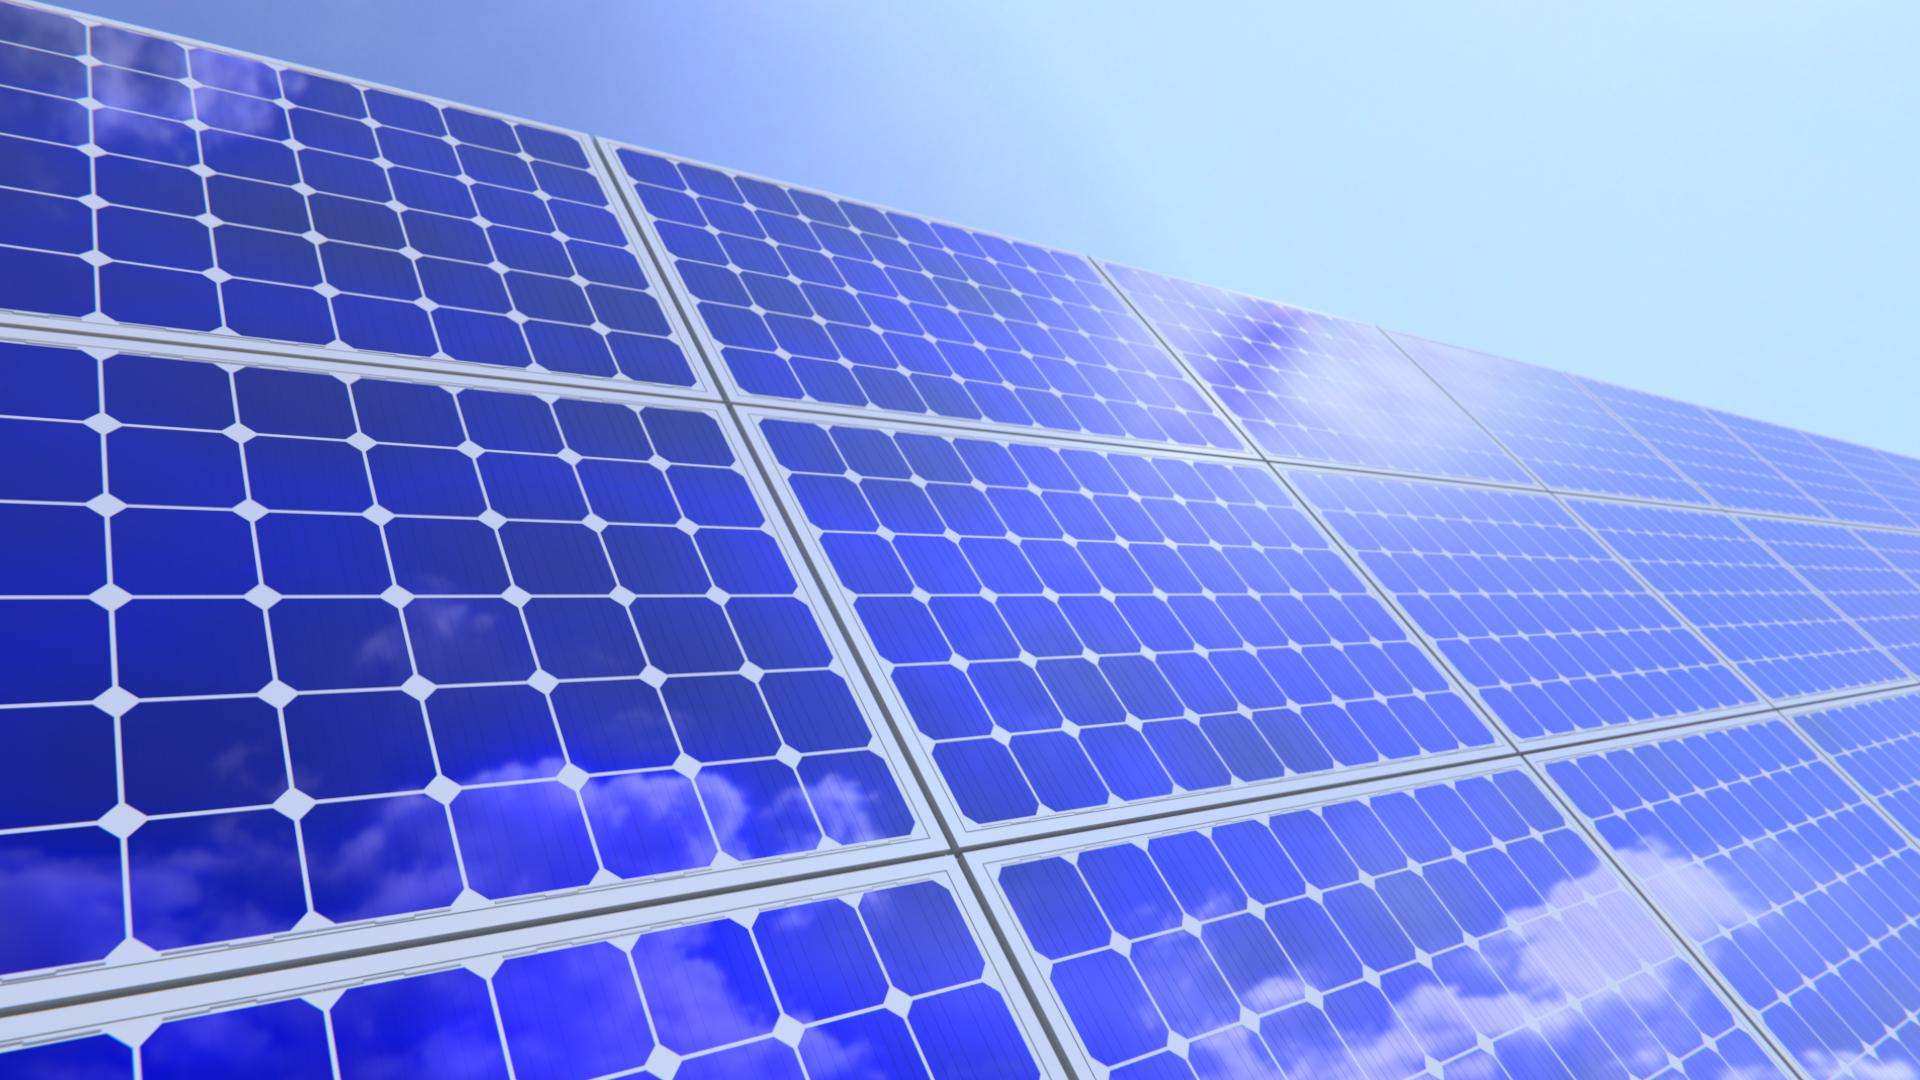 Solar-Paneel Strom